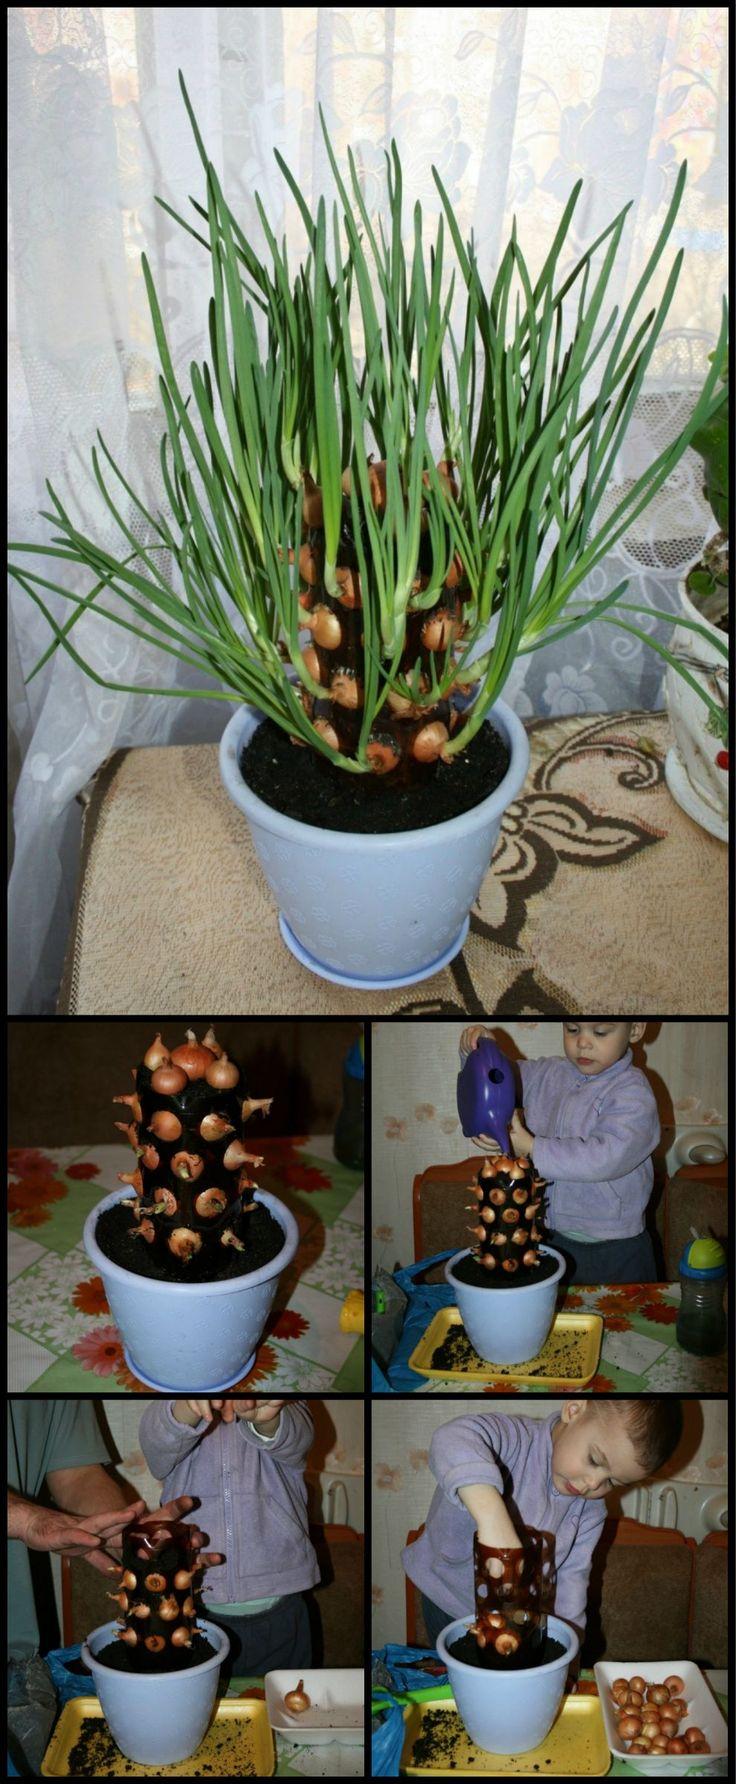 Garden adventures white turmeric curcuma zedoaria - Find This Pin And More On Kitchen Garden Indoor Or Outdoor